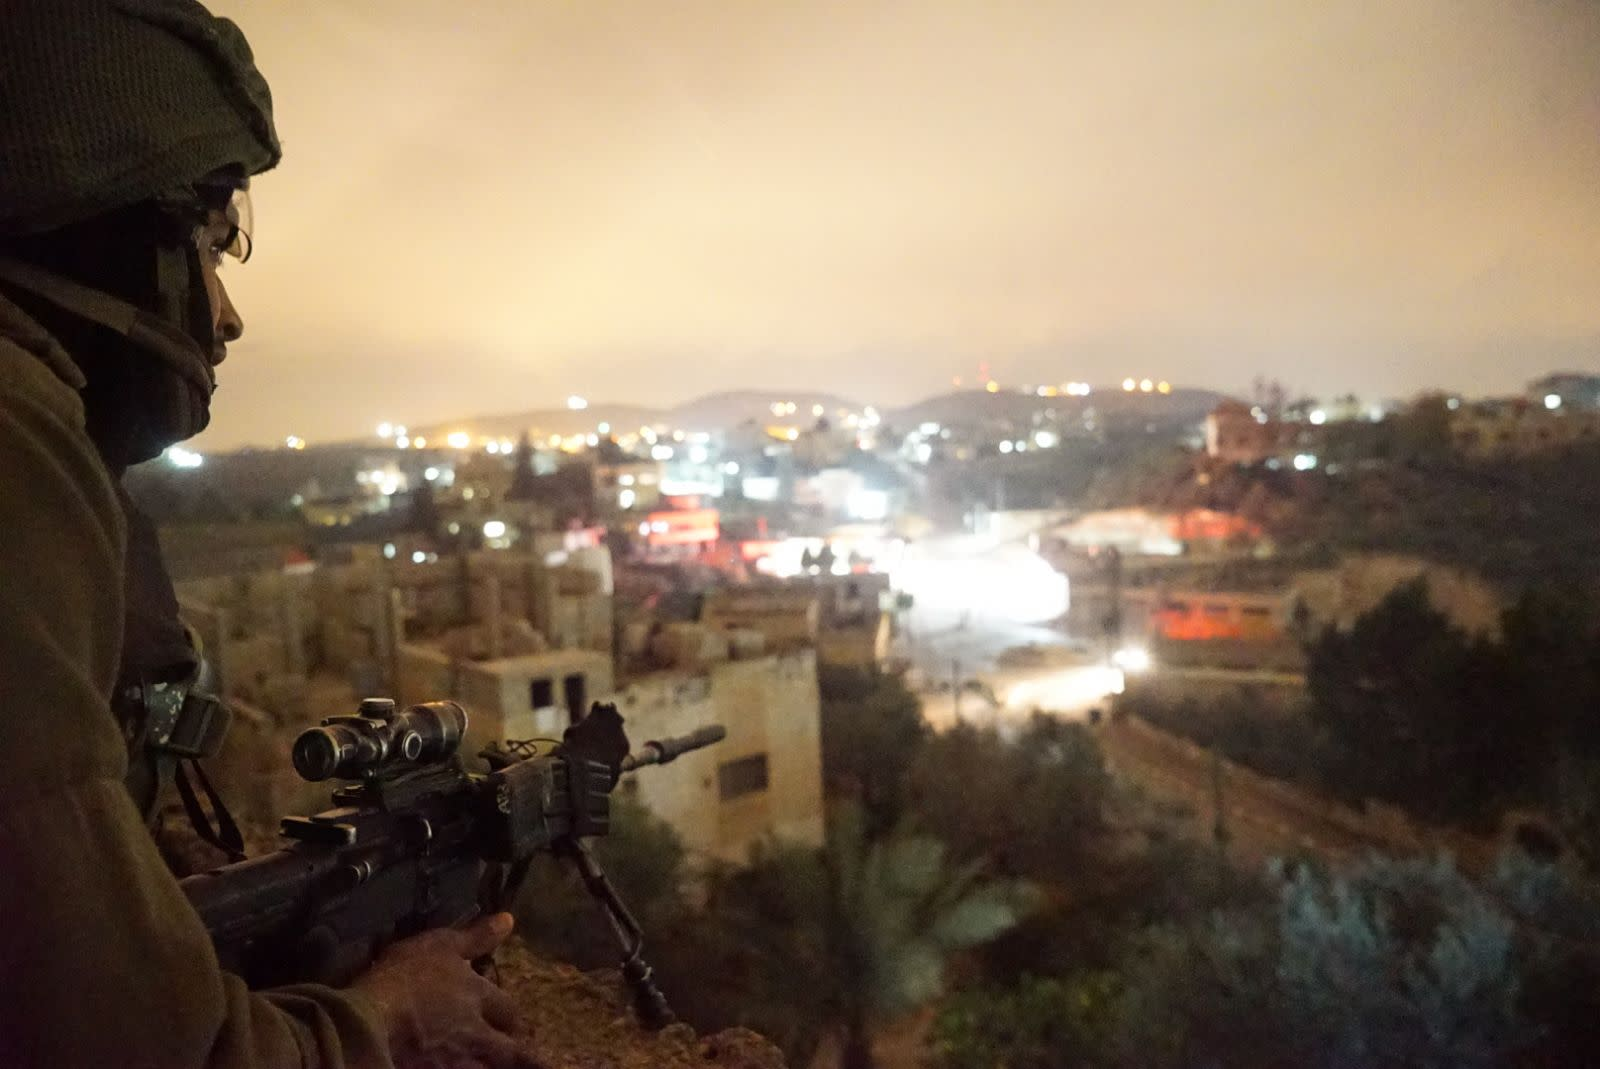 An IDF sniper during the raid on the West Bank village of Al-Yumun. (IDF SPOKESPERSON'S UNIT)